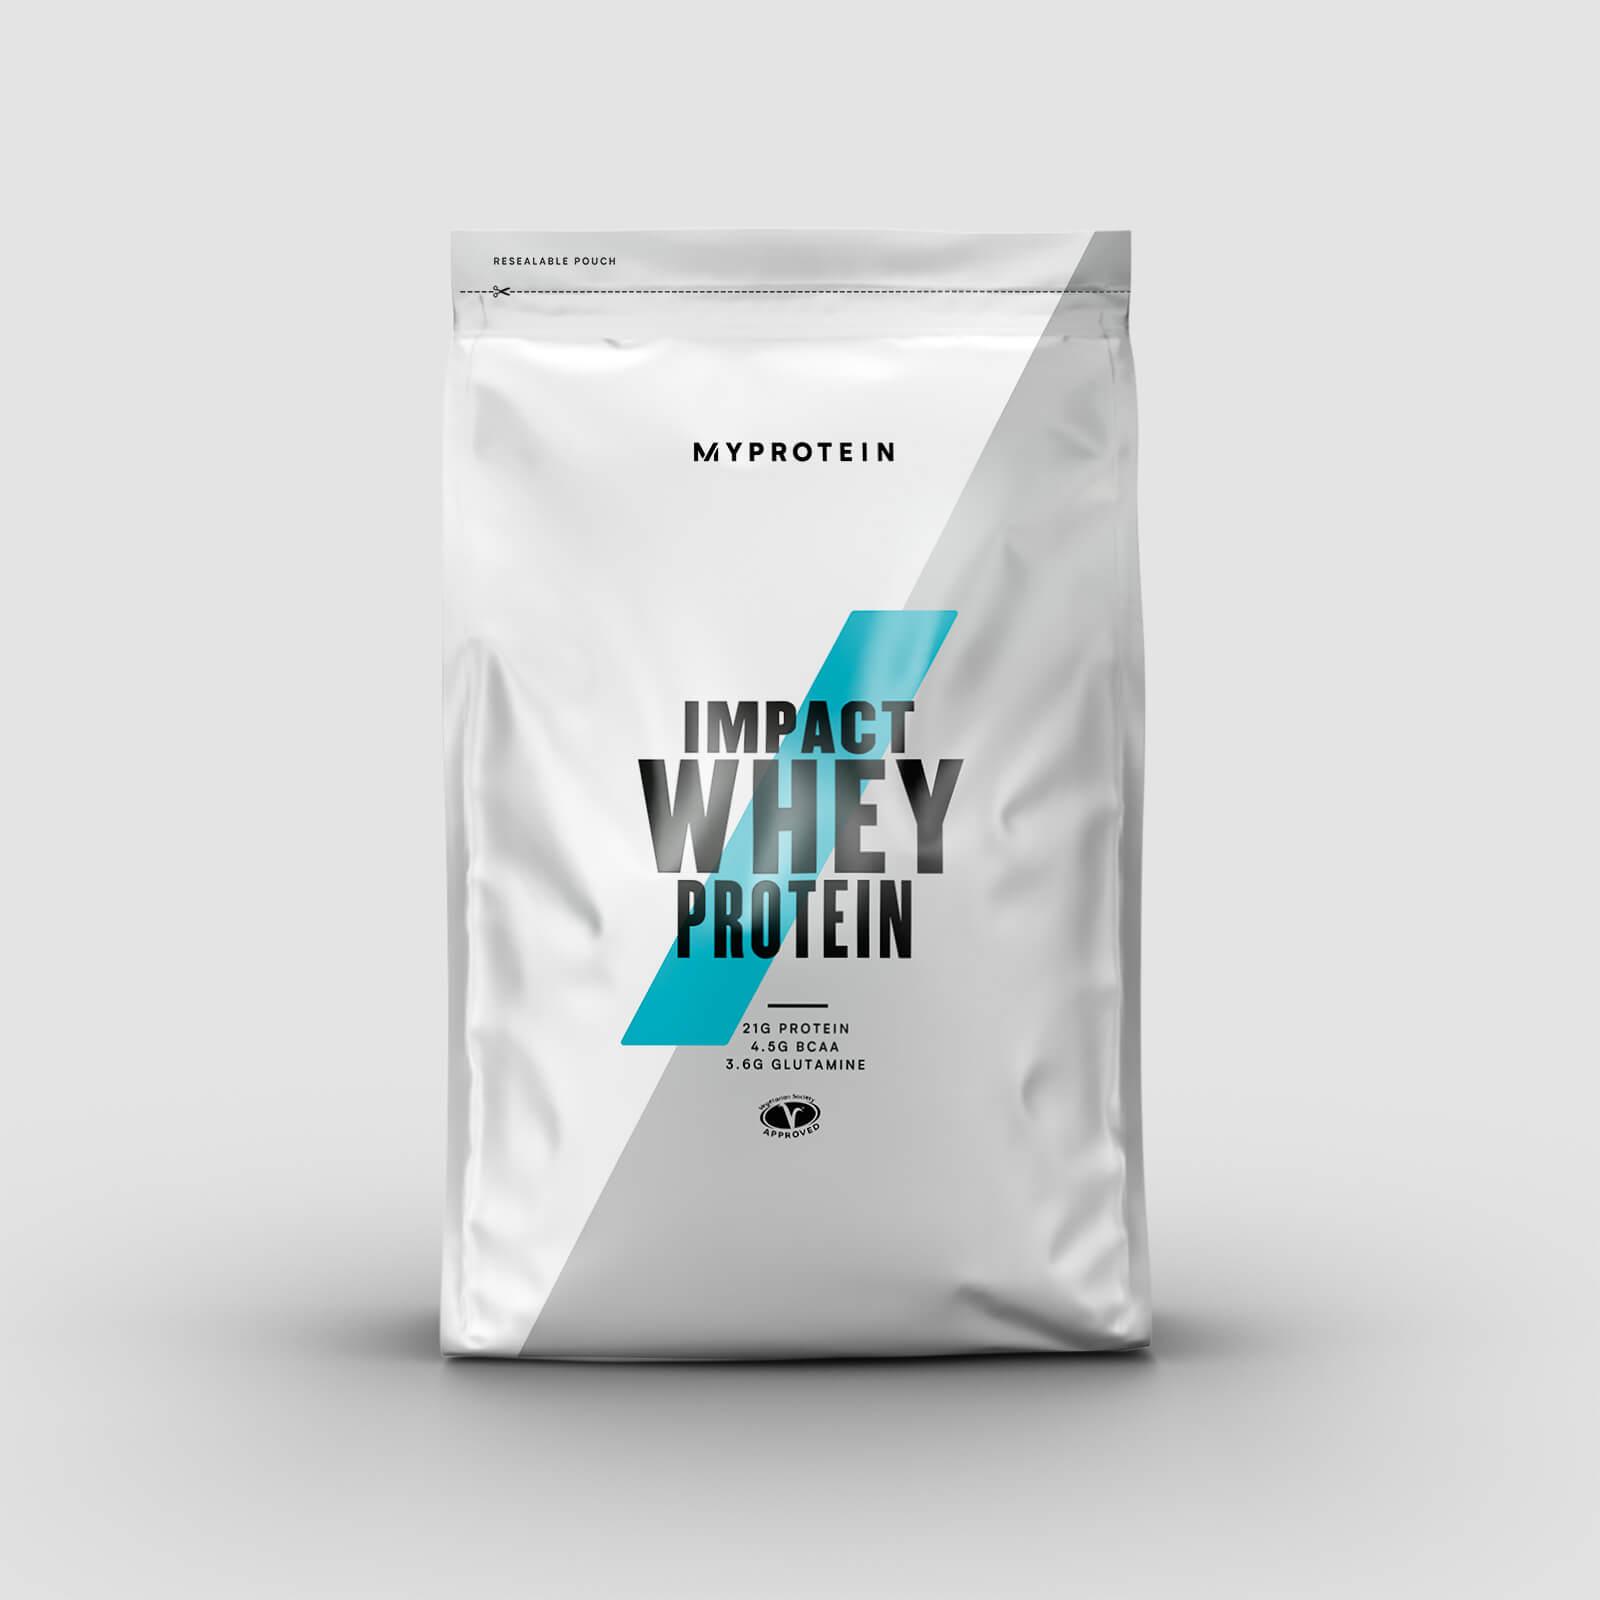 Myprotein Impact Whey Protein - 2.5kg - Cookies ja Cream